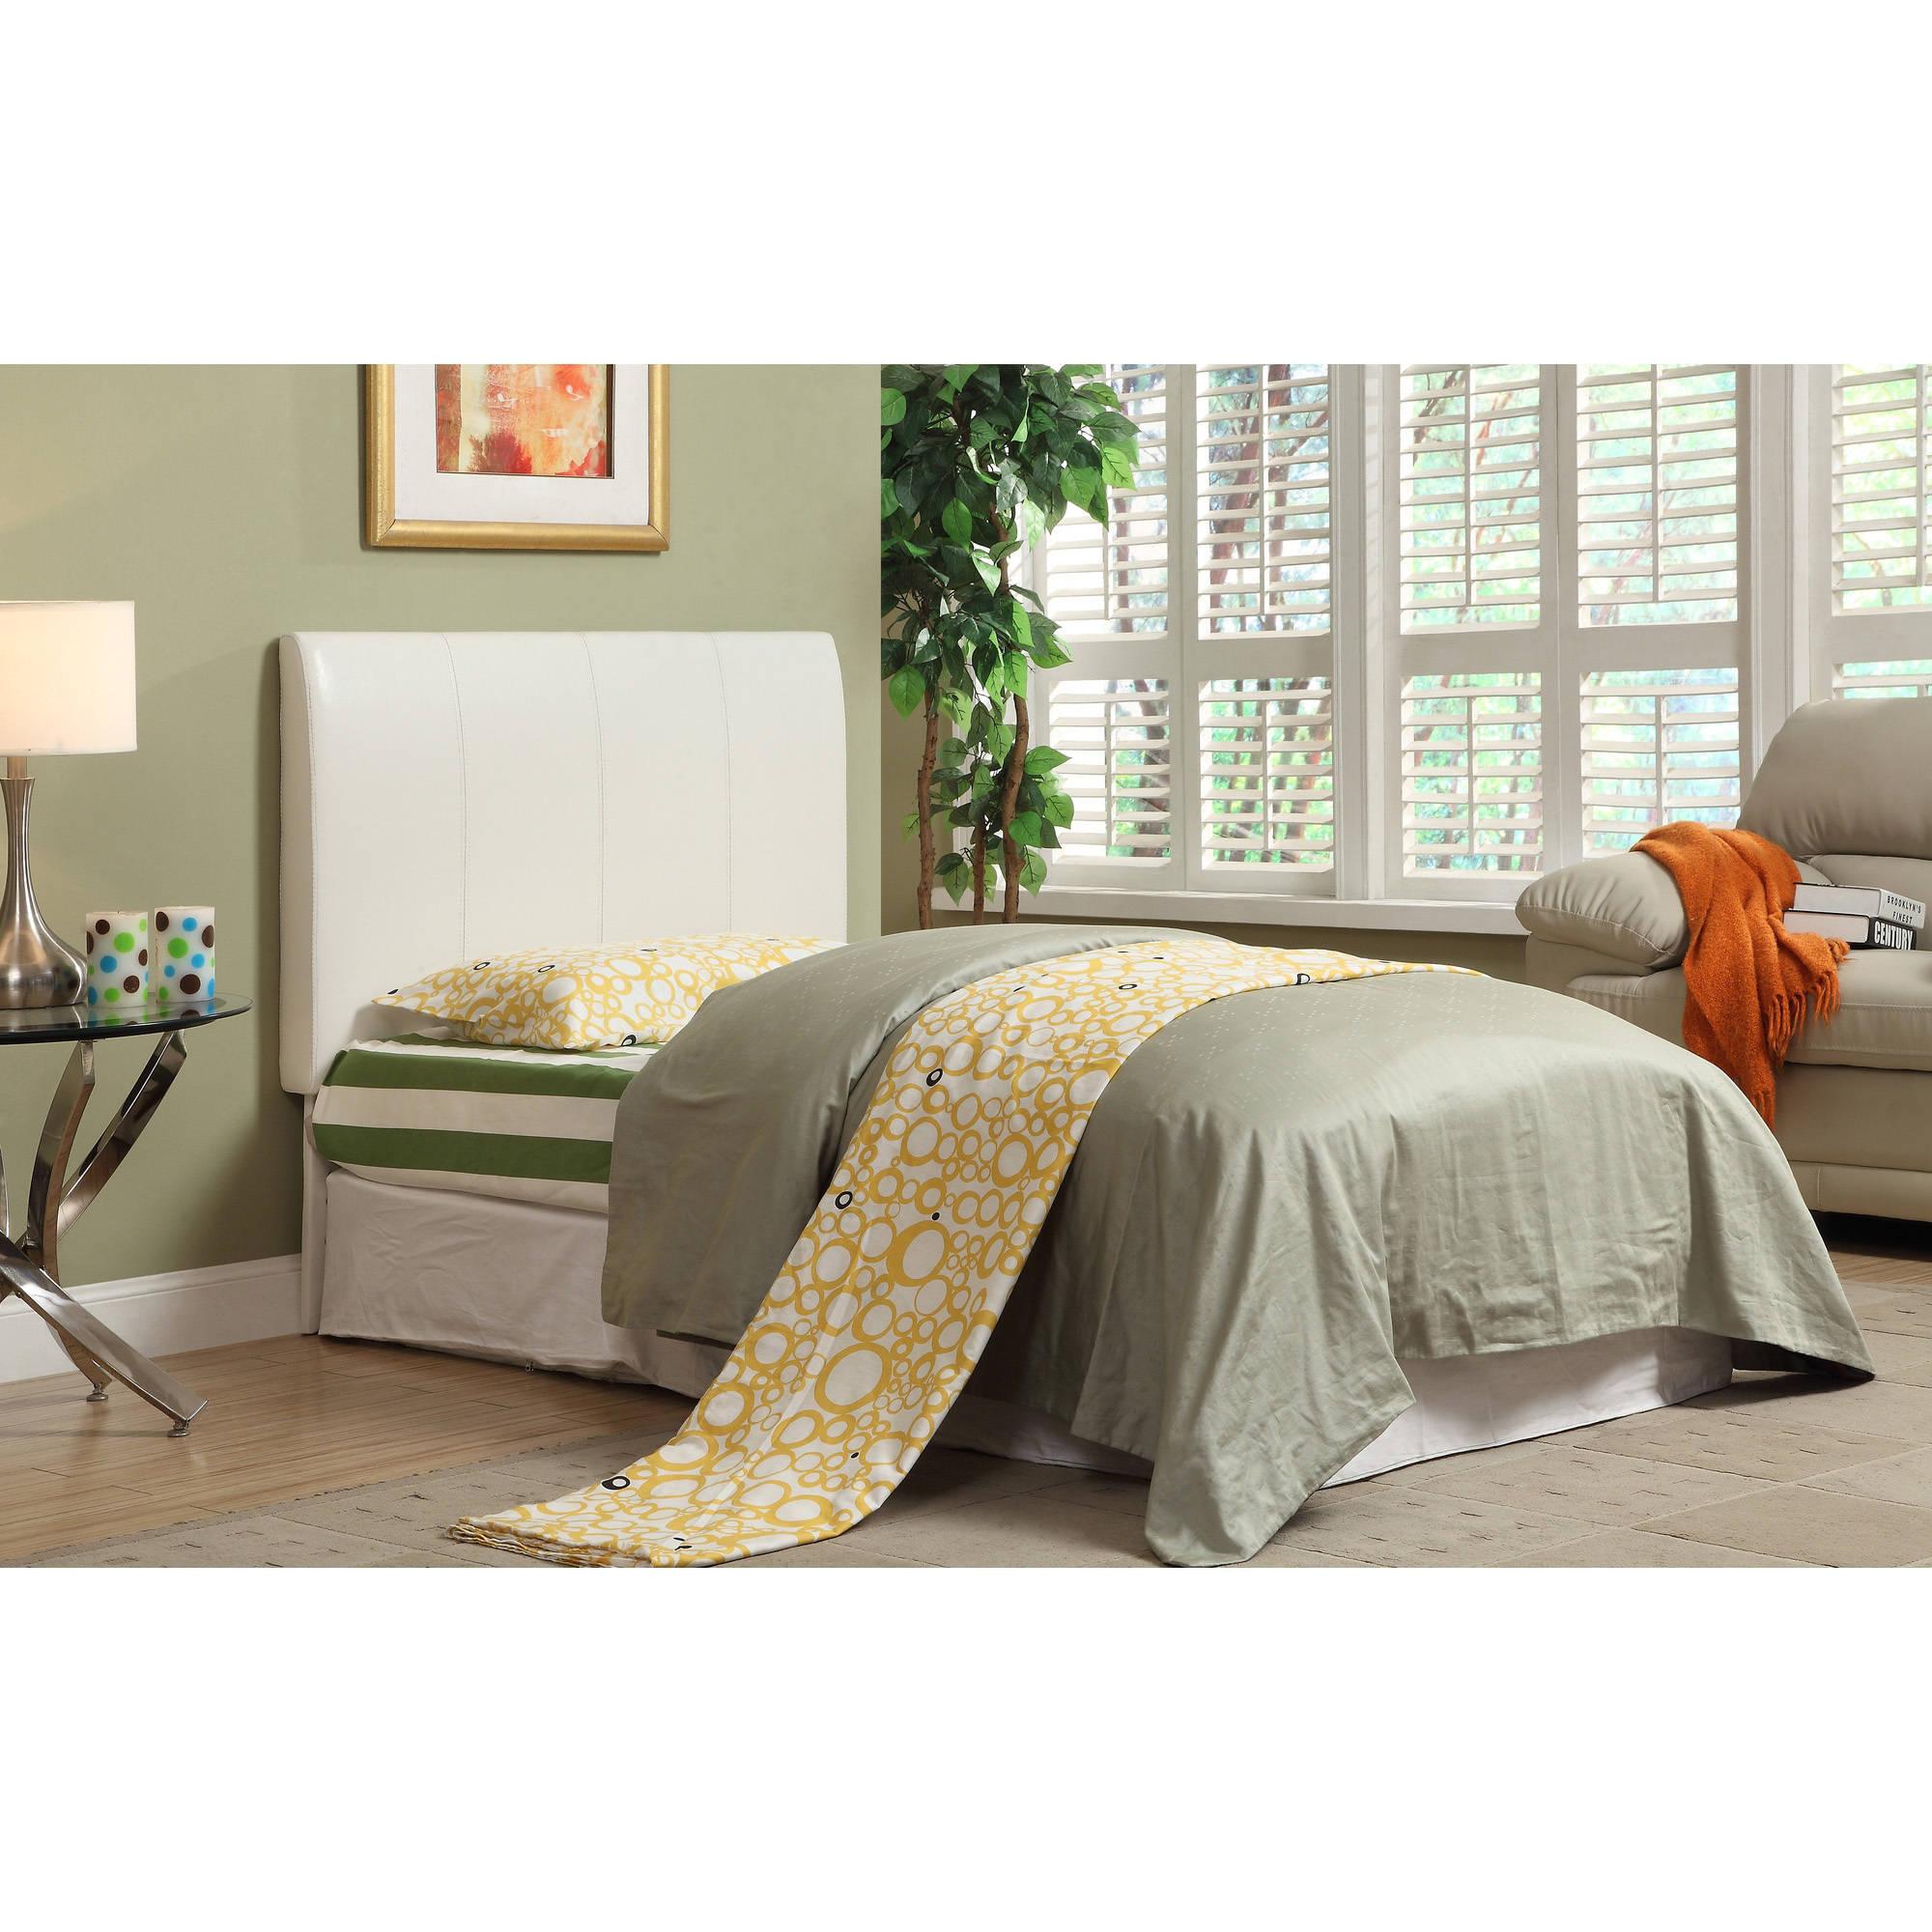 Furniture of America Marylou Modern Leatherette Twin Headboard, Multiple Colors